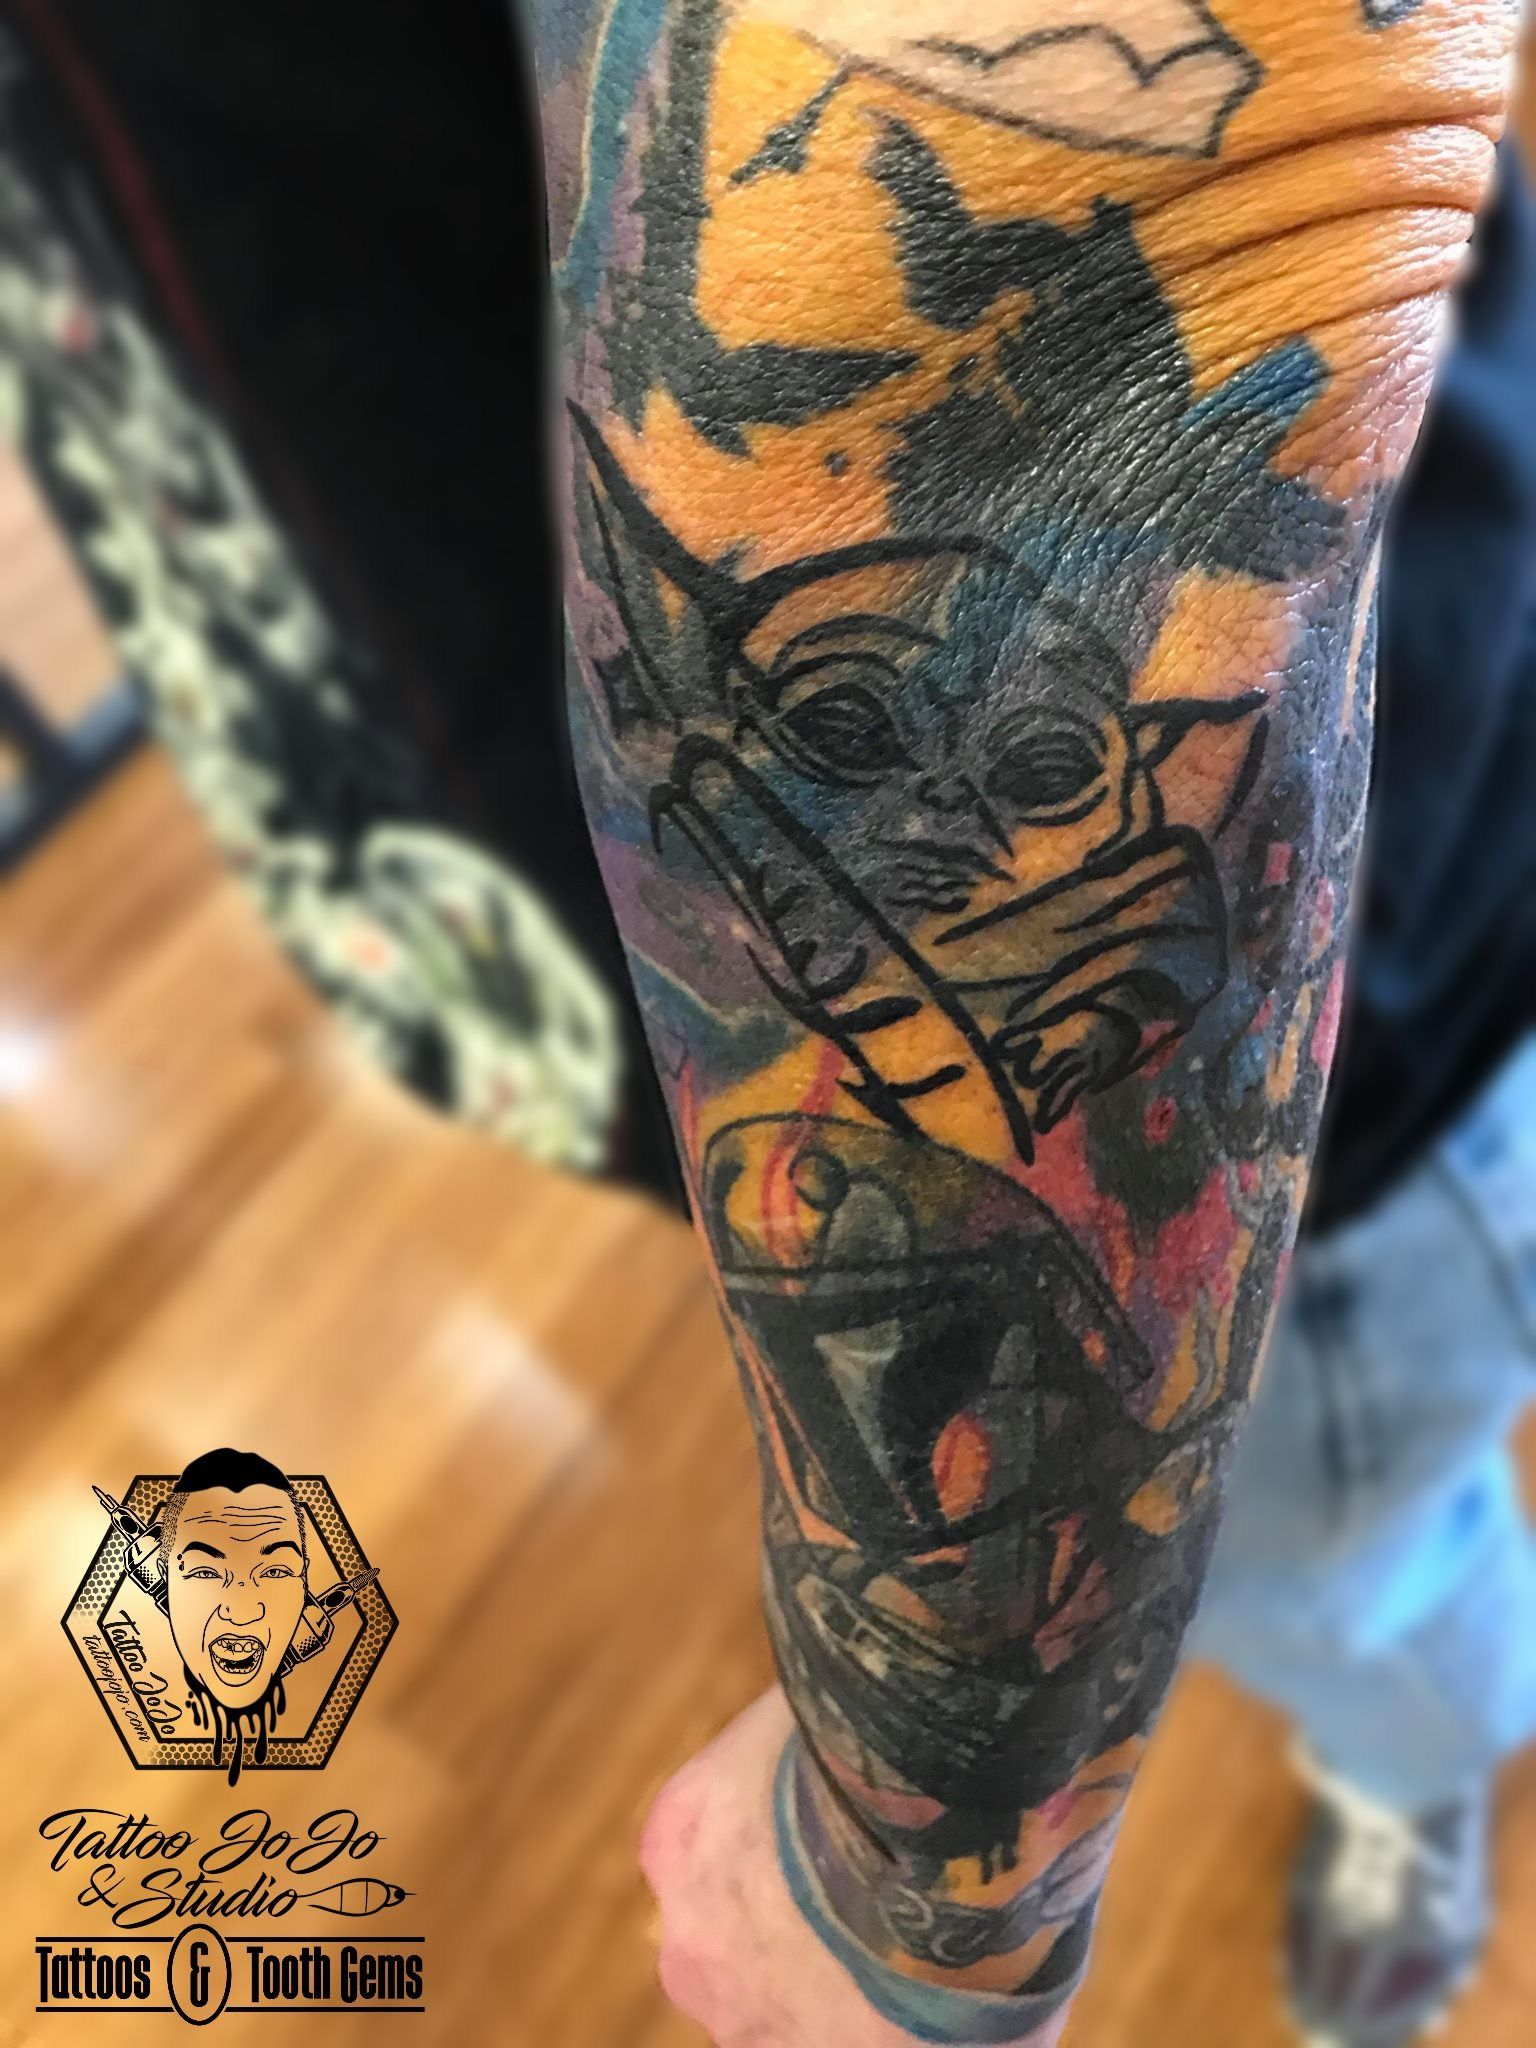 Added cute lil Yoda to this blastover sleeve! tattoojojo